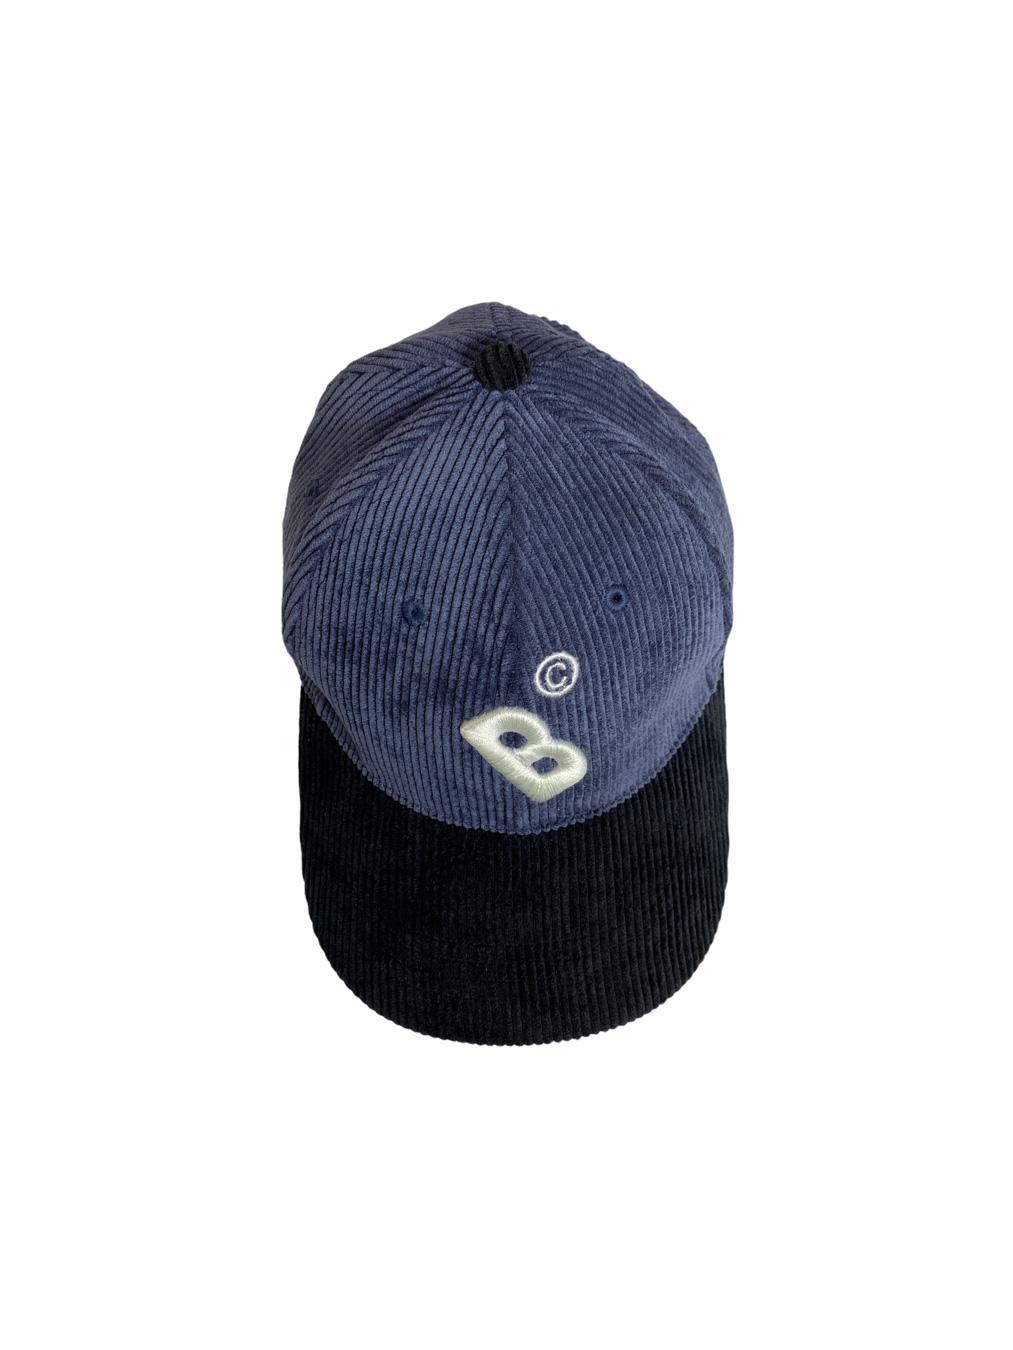 Bangkokr Cap (Navy/Black Corduroy)